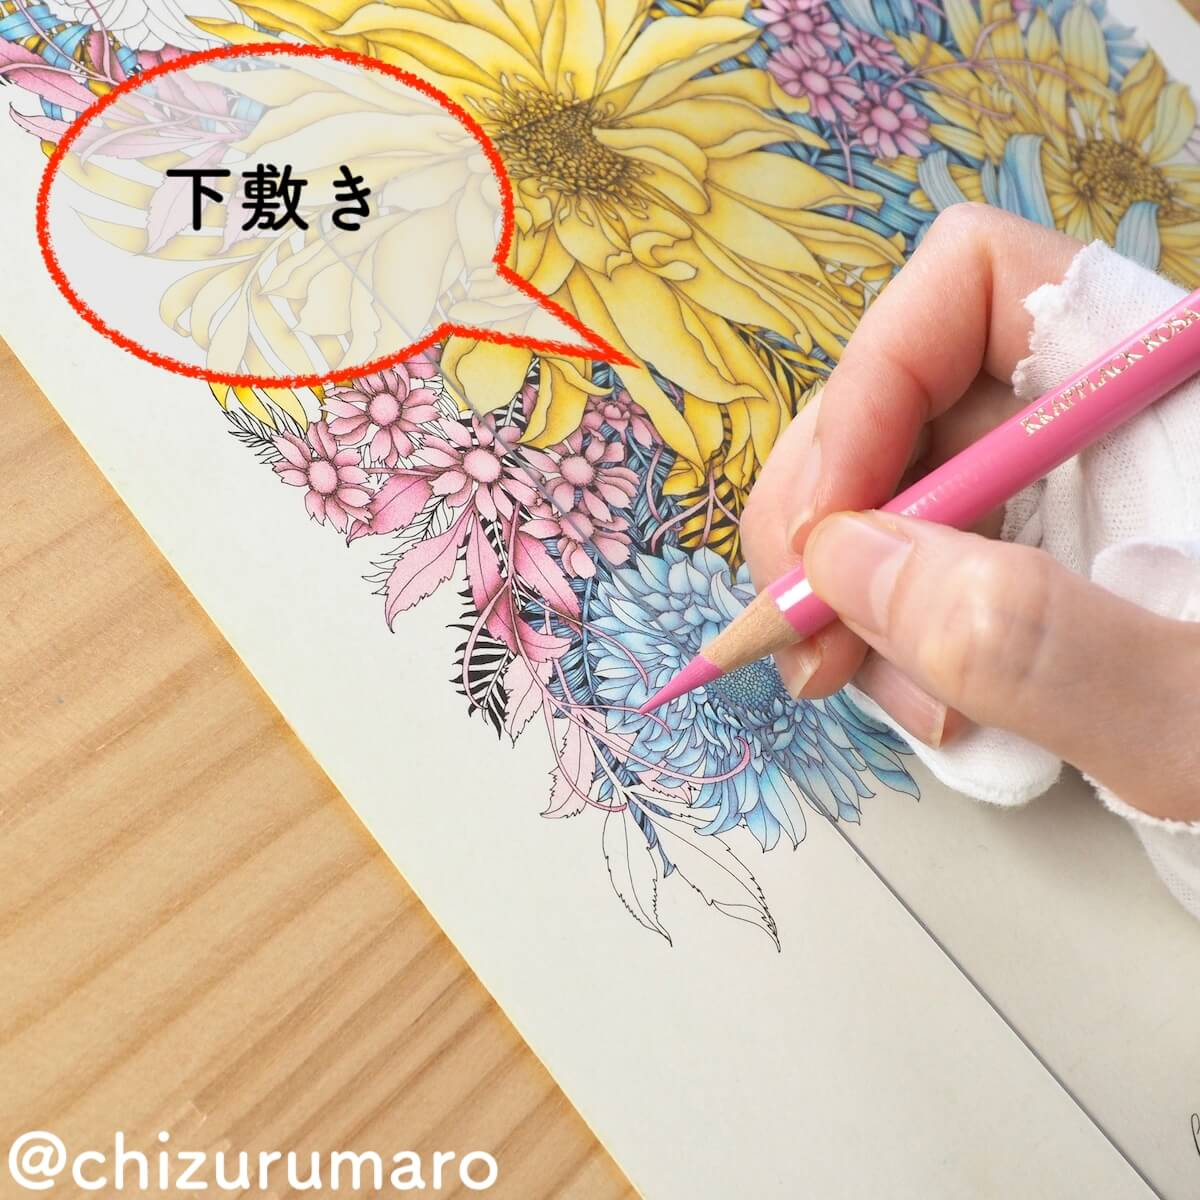 f:id:chizurumaro:20190703110713j:plain